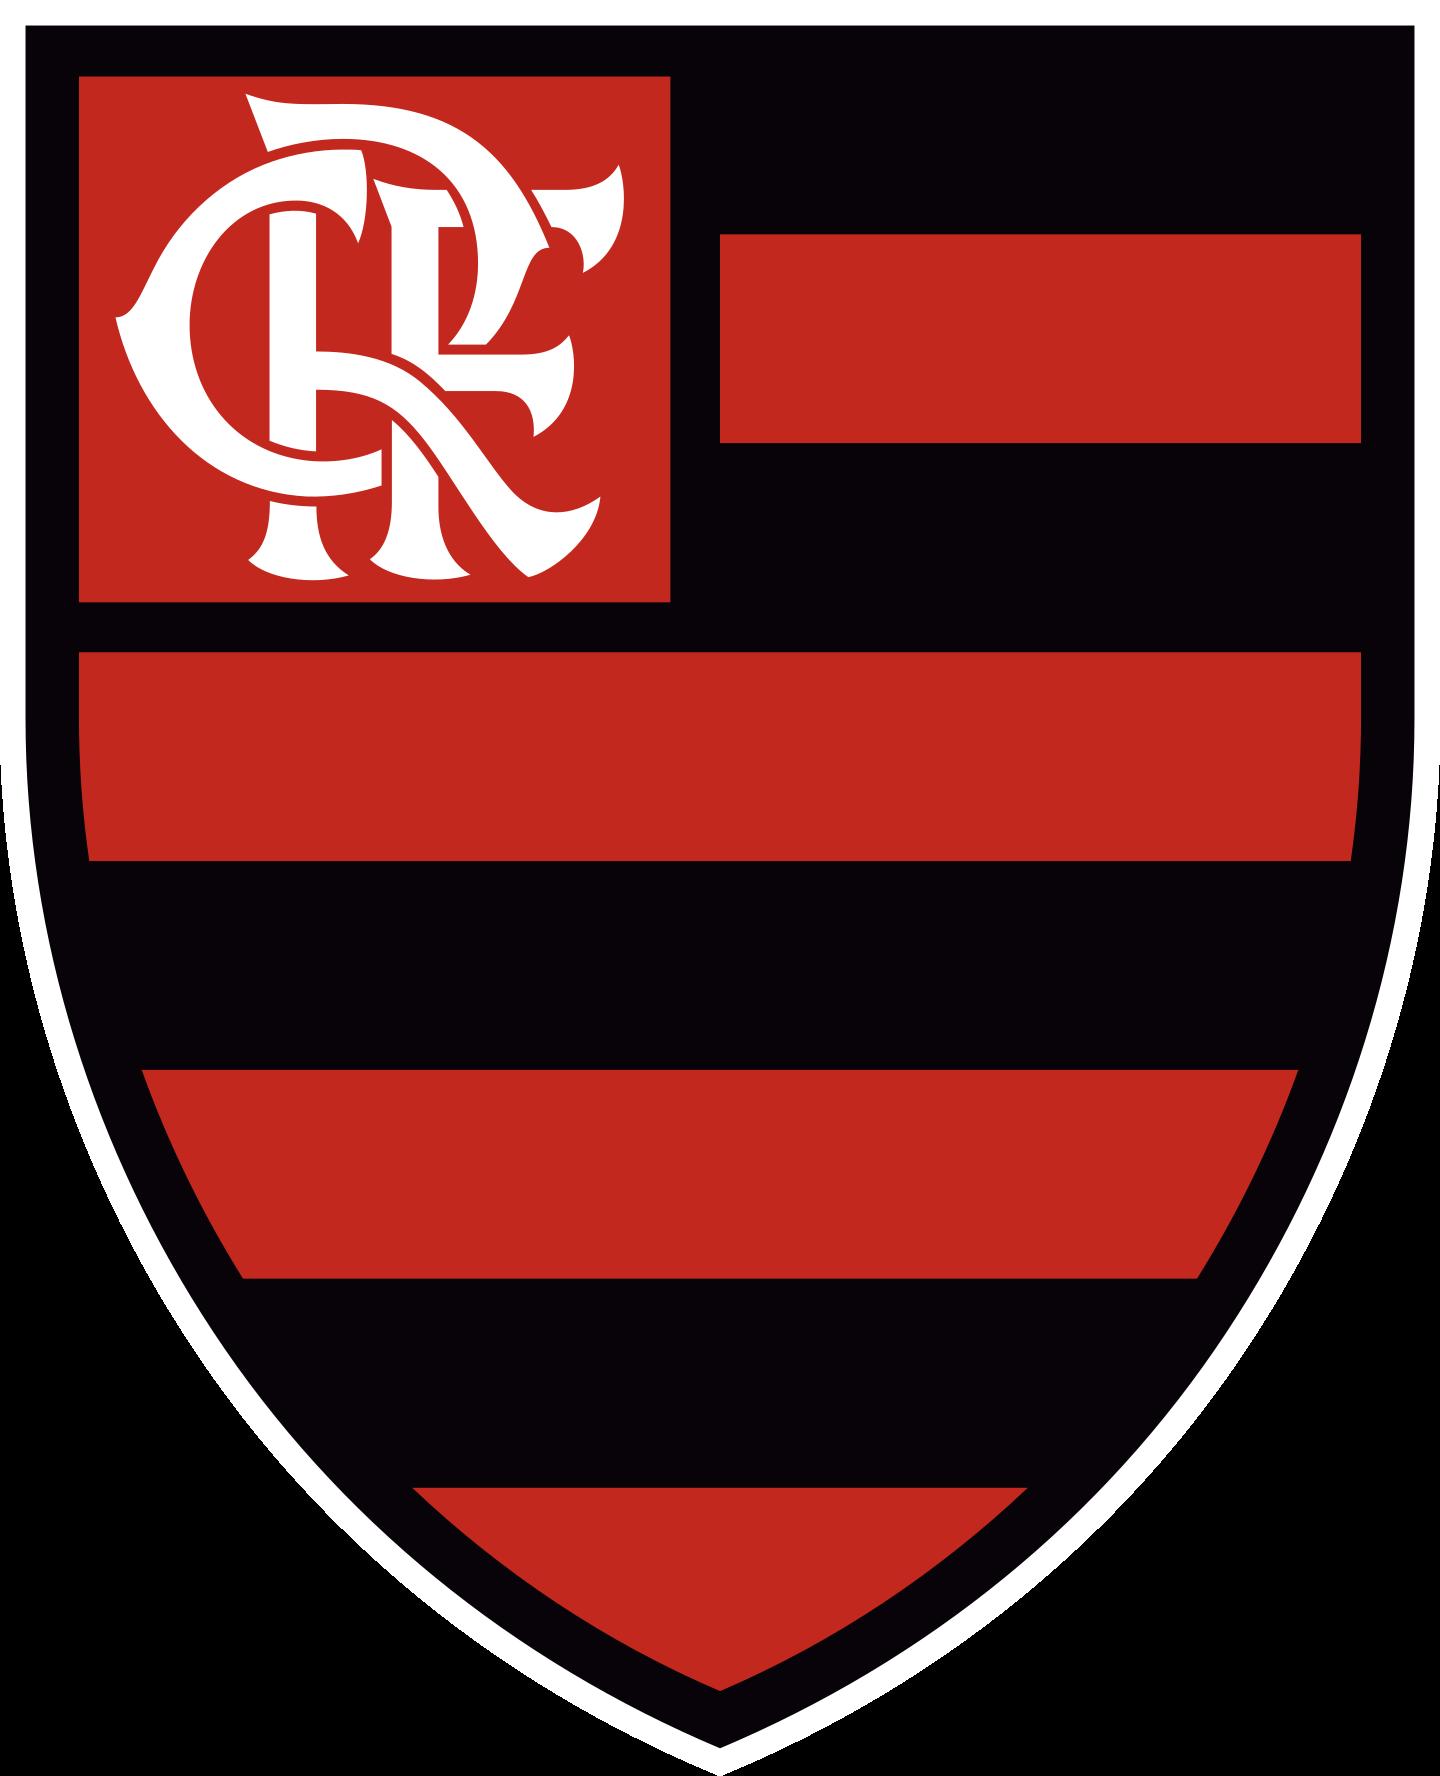 flamengo logo 6 - Flamengo Logo - Flamengo Escudo